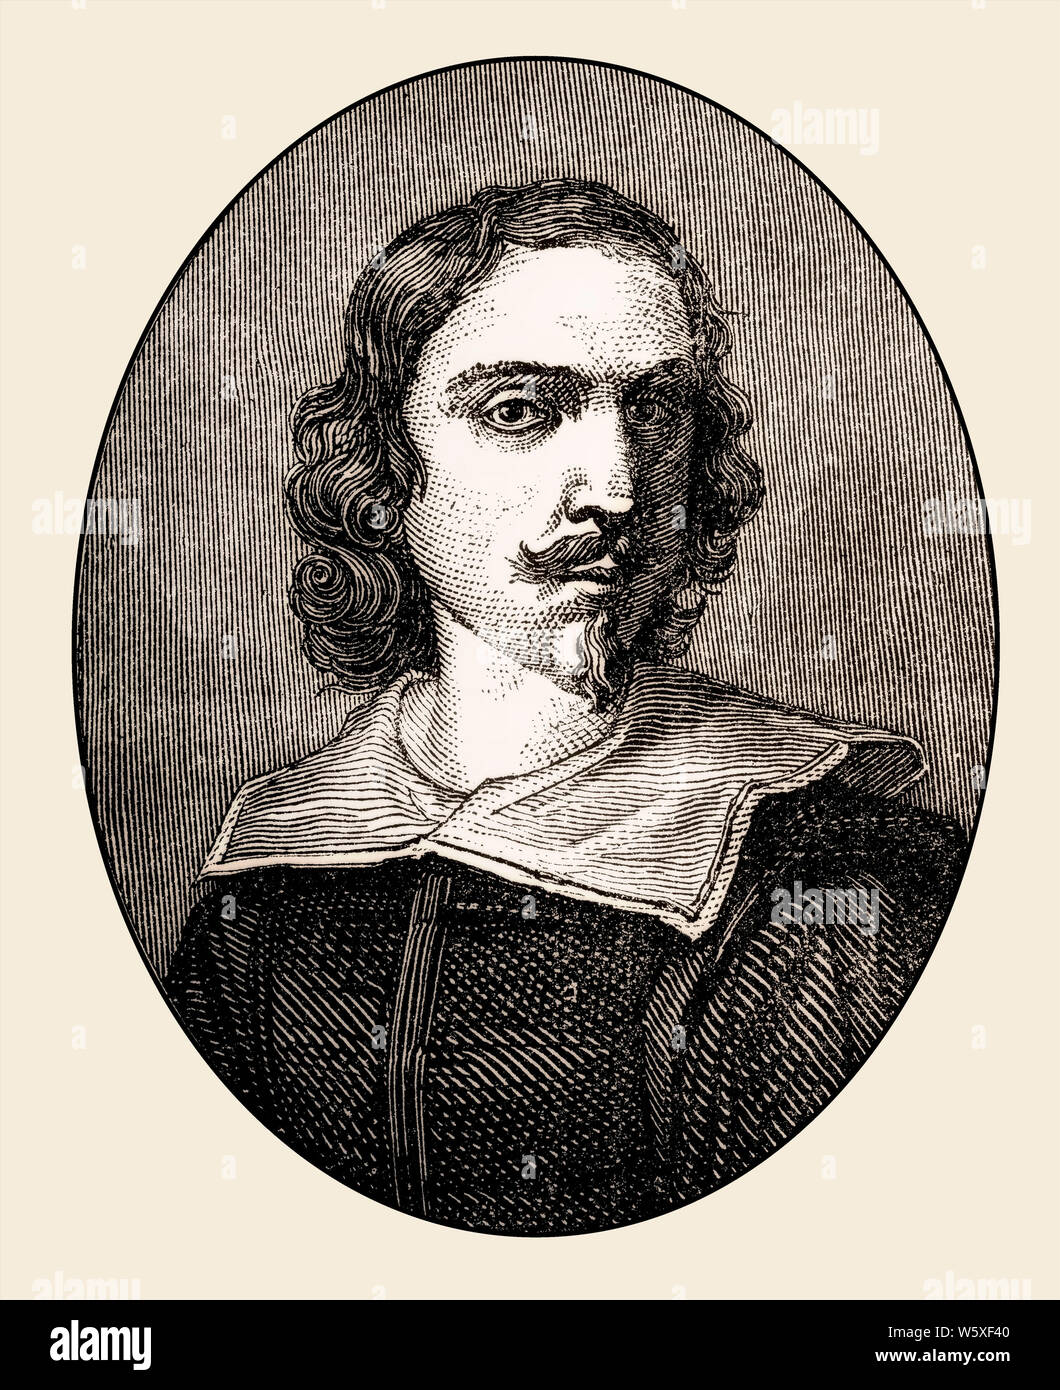 Francesco Albani o Albano, 1578 - 1660, un pintor barroco italiano Foto de stock